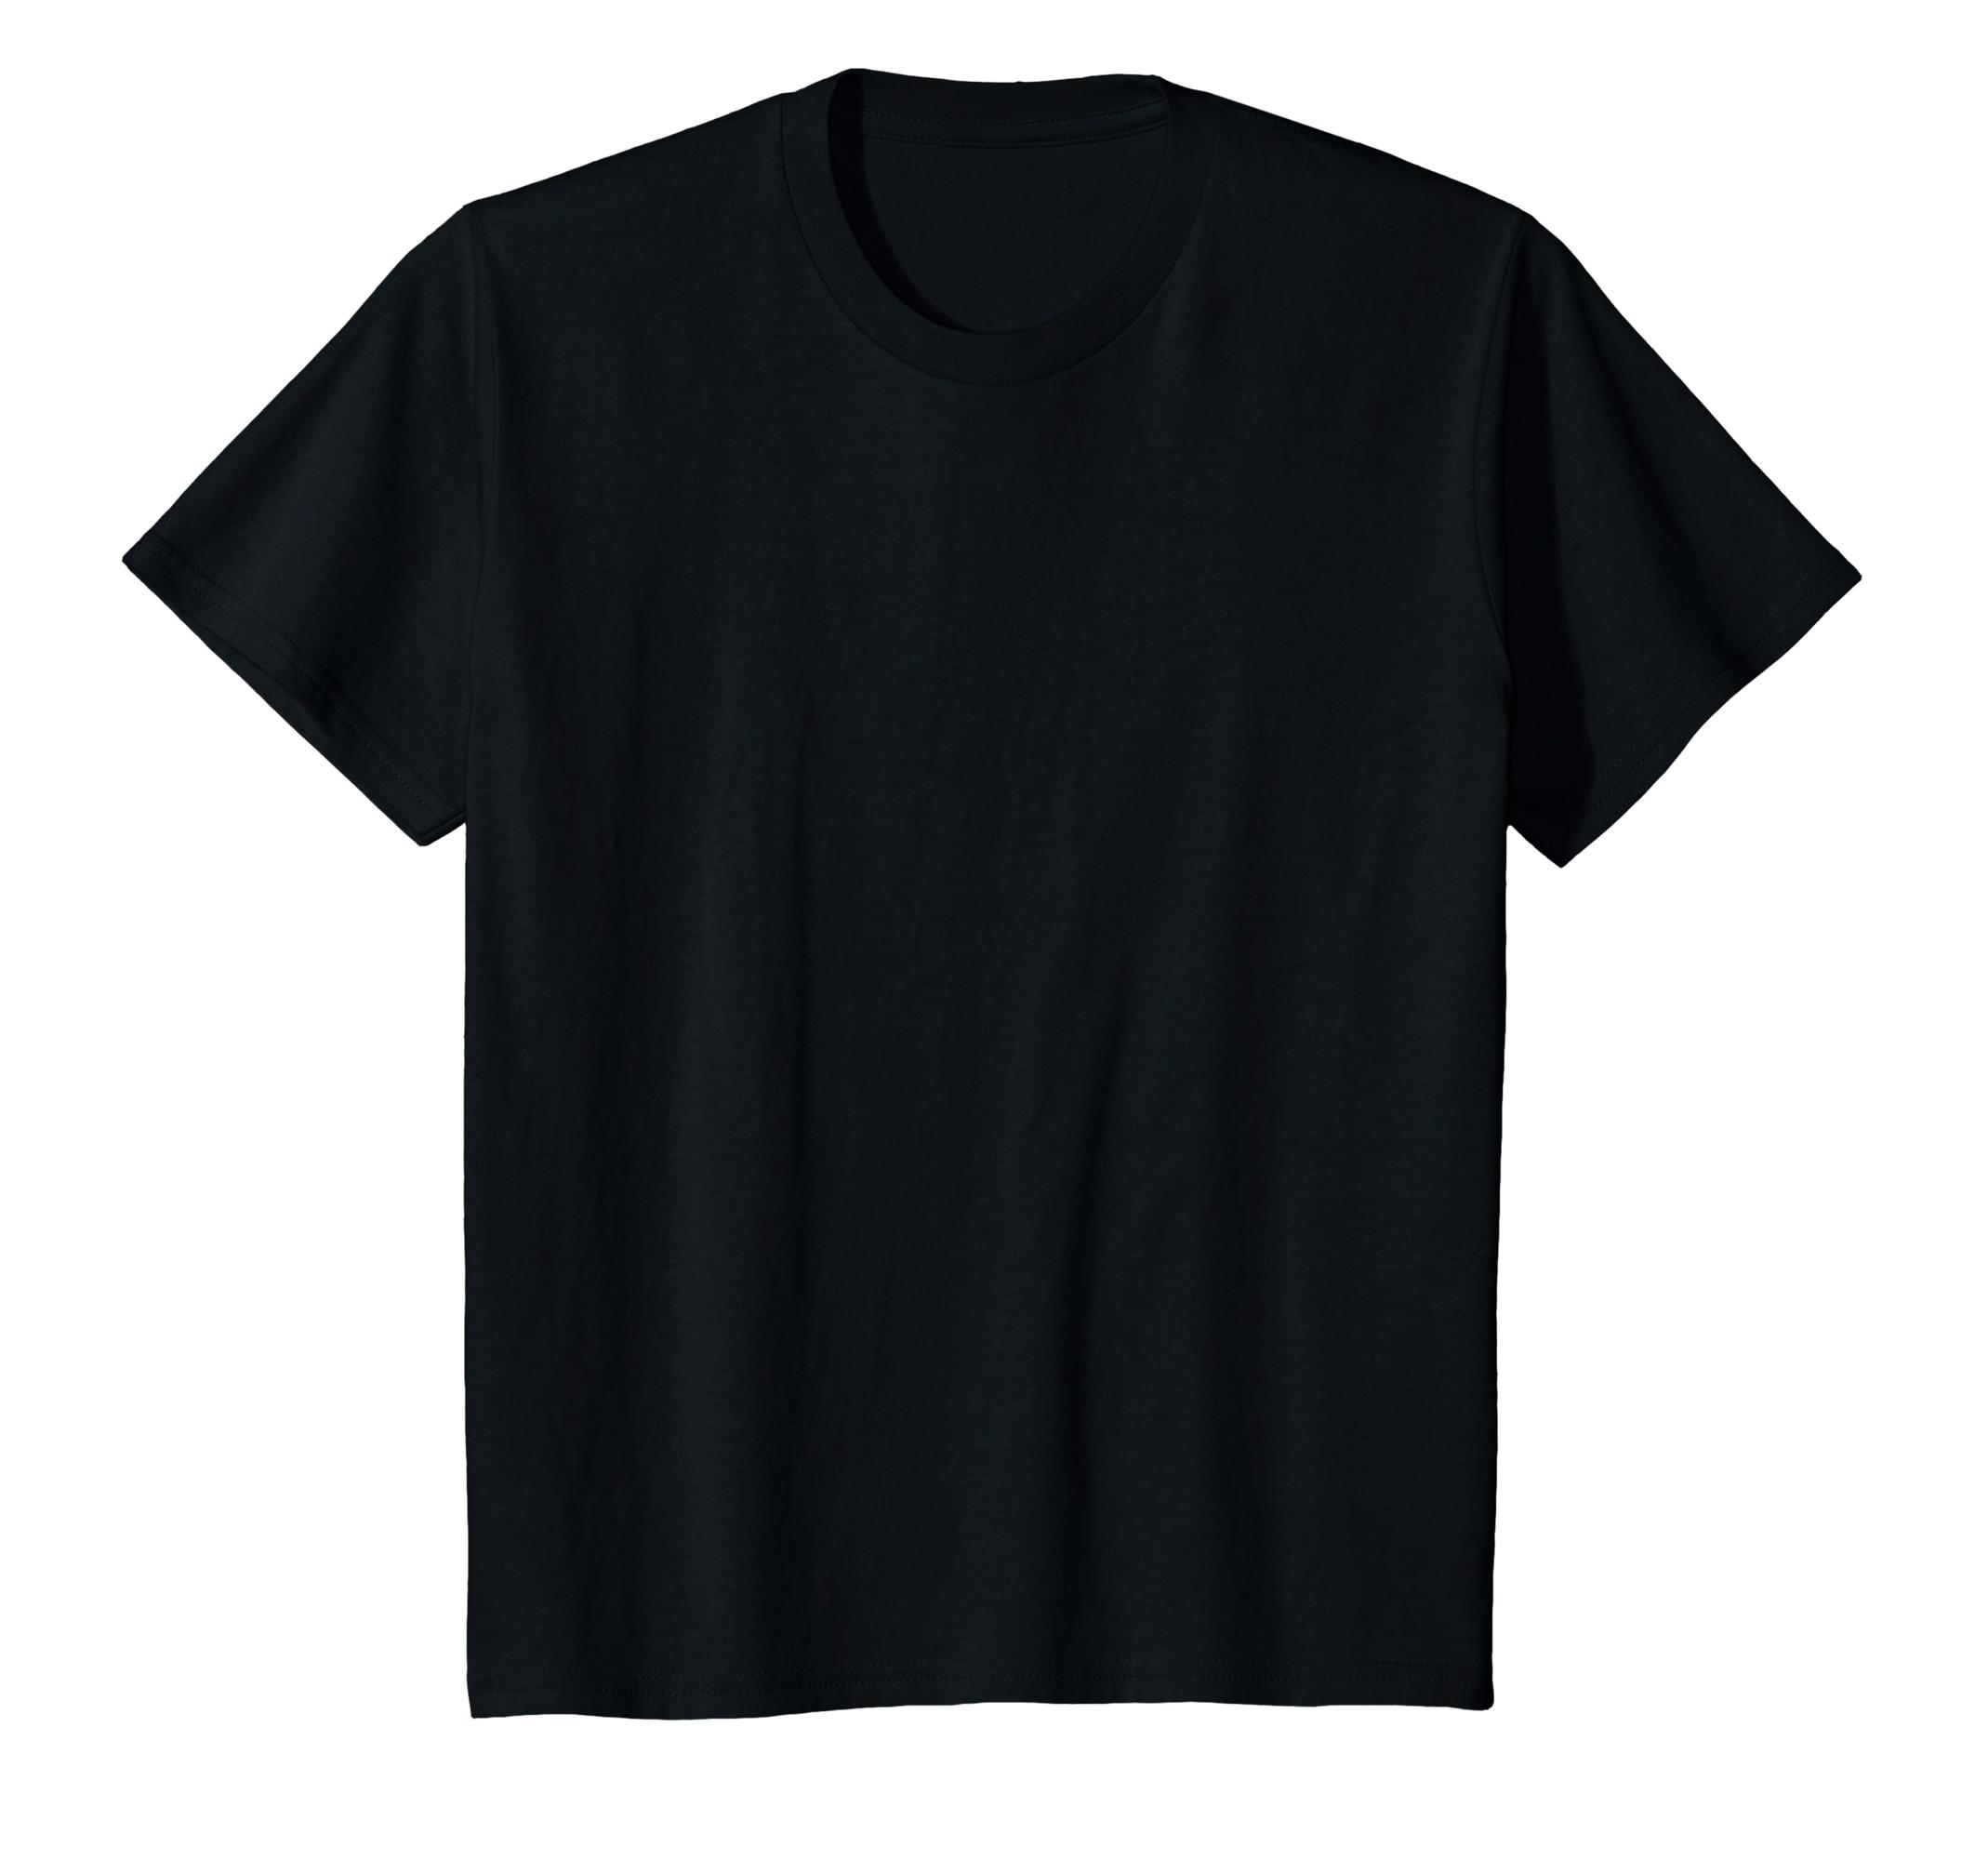 Boys Personalised Big Brother T-Shirt Childrens Dinosaur Tshirt Kids Top Gift